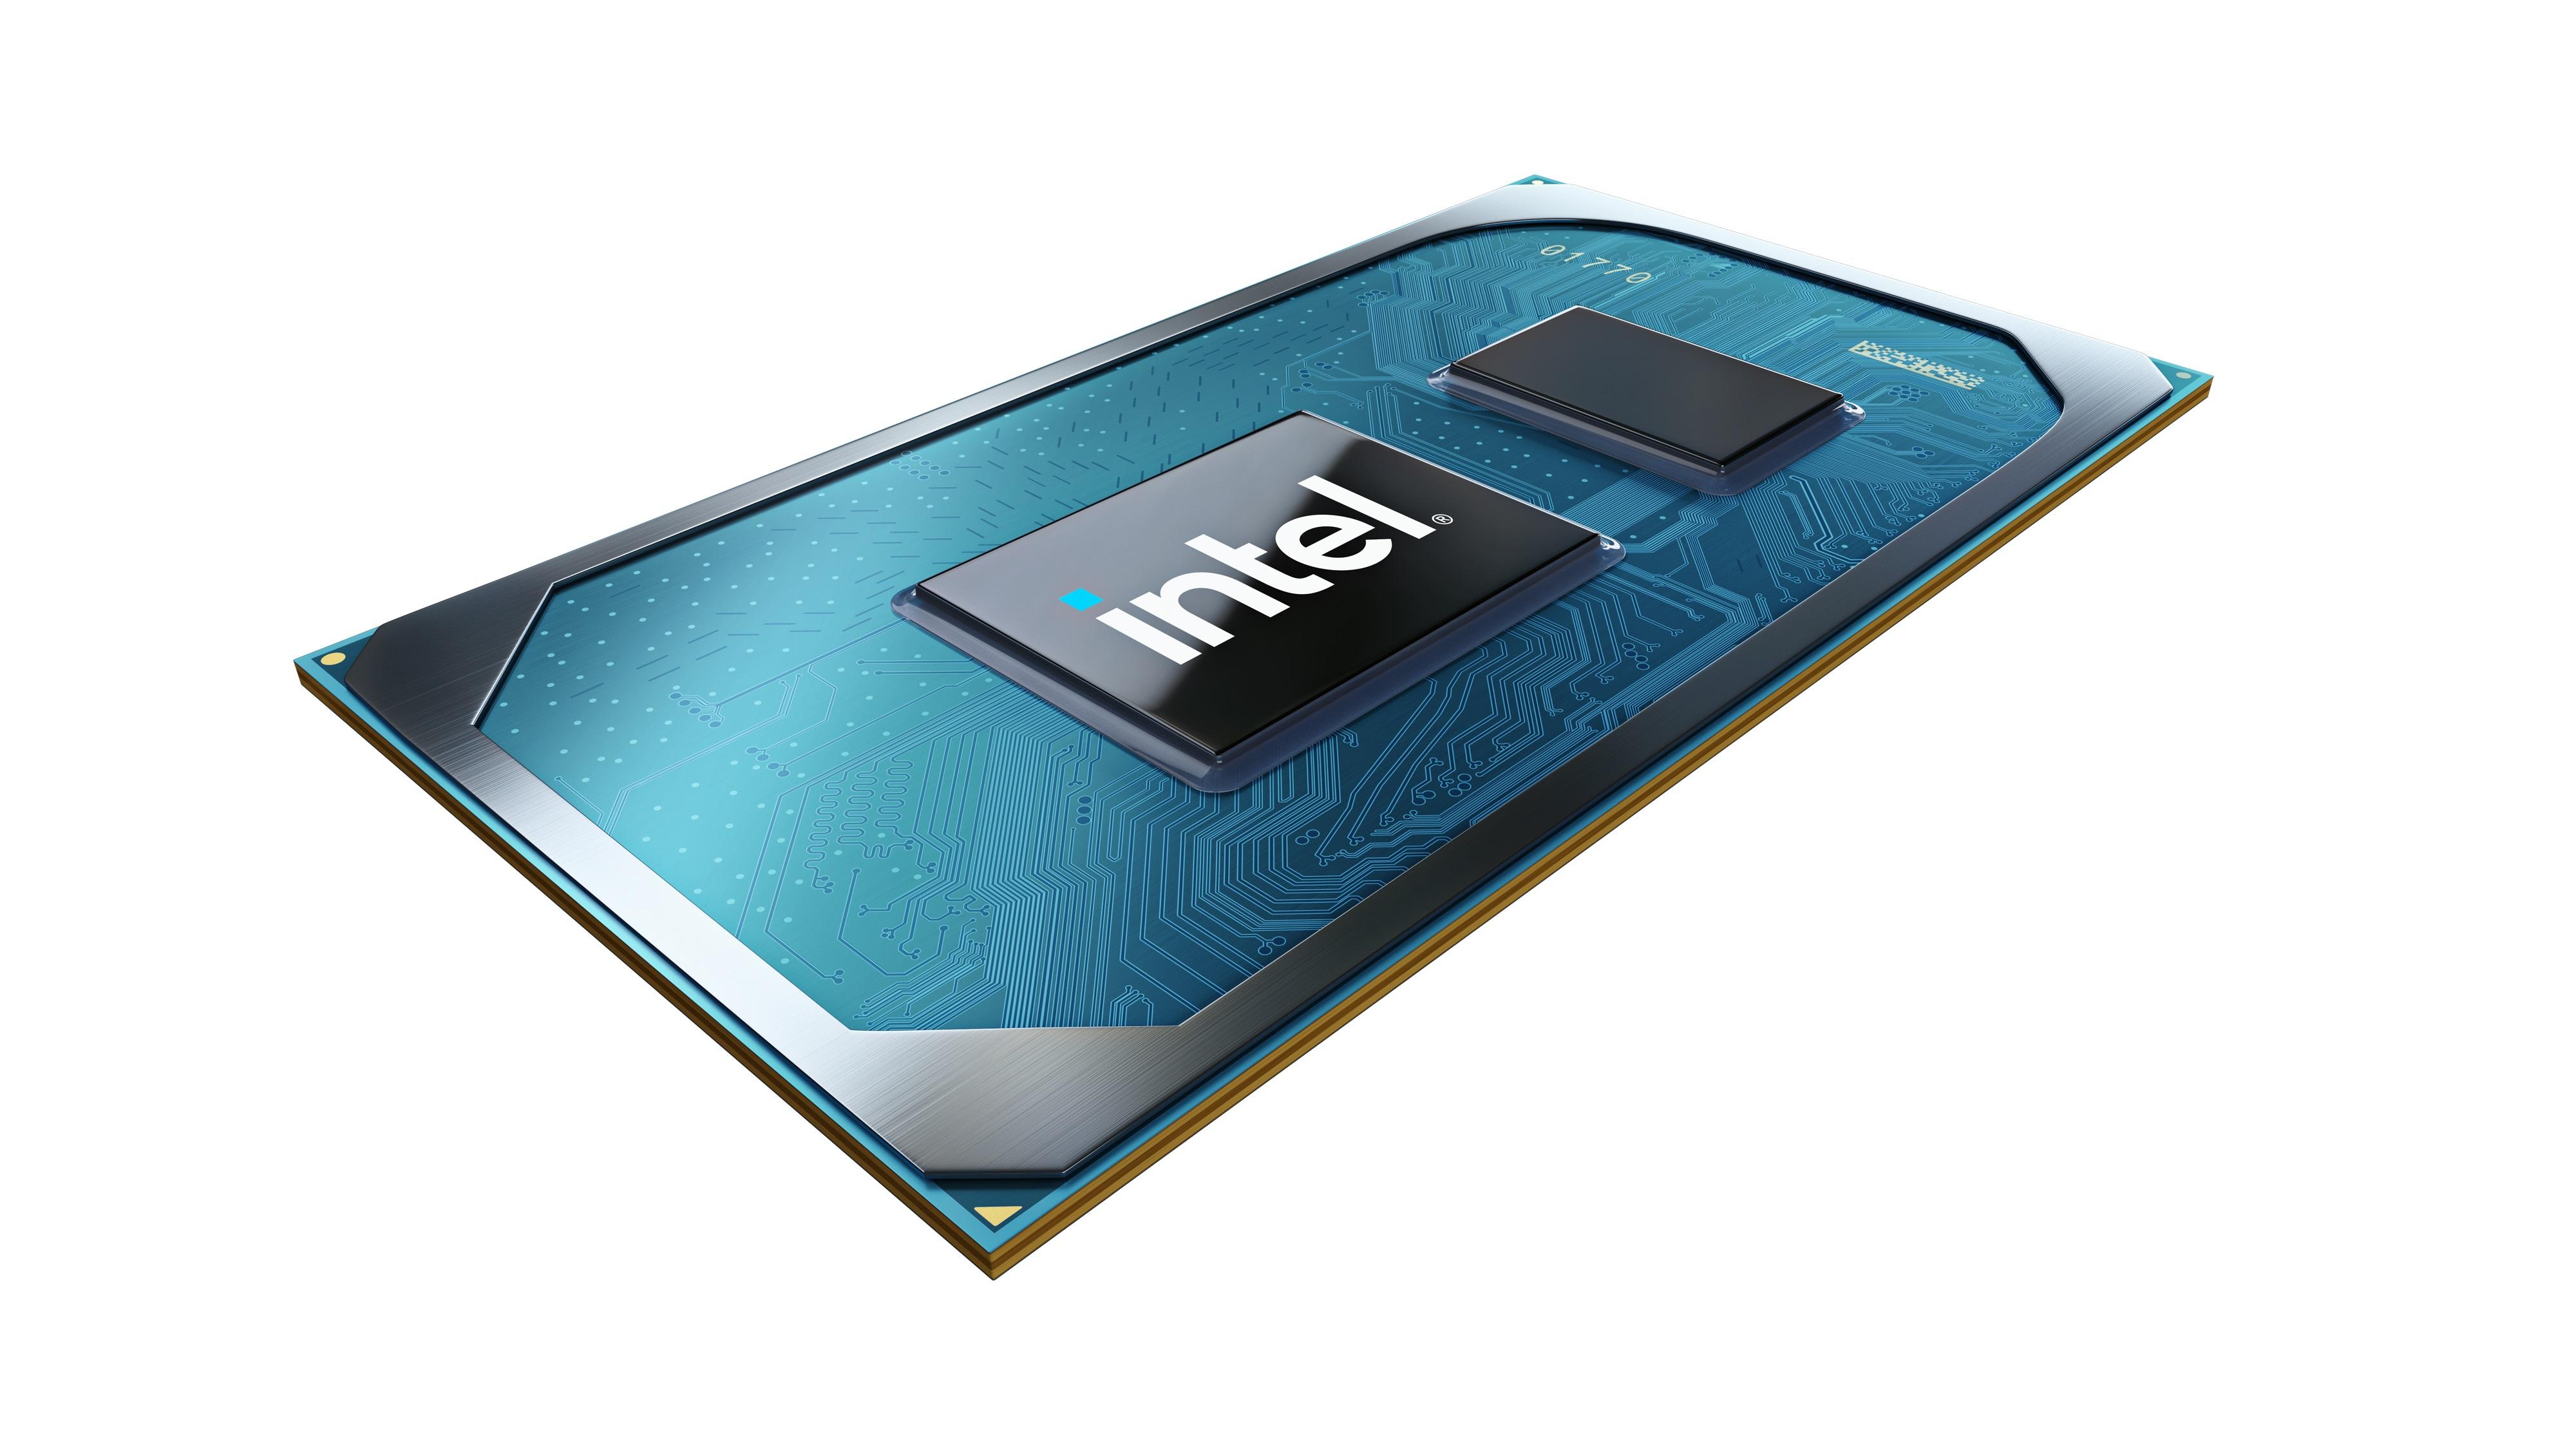 Asus ExperBook B1 B1500 je poháňaný mobilným procesorom Intel Core i3-1115G4 s taktom až 4,1 GHz